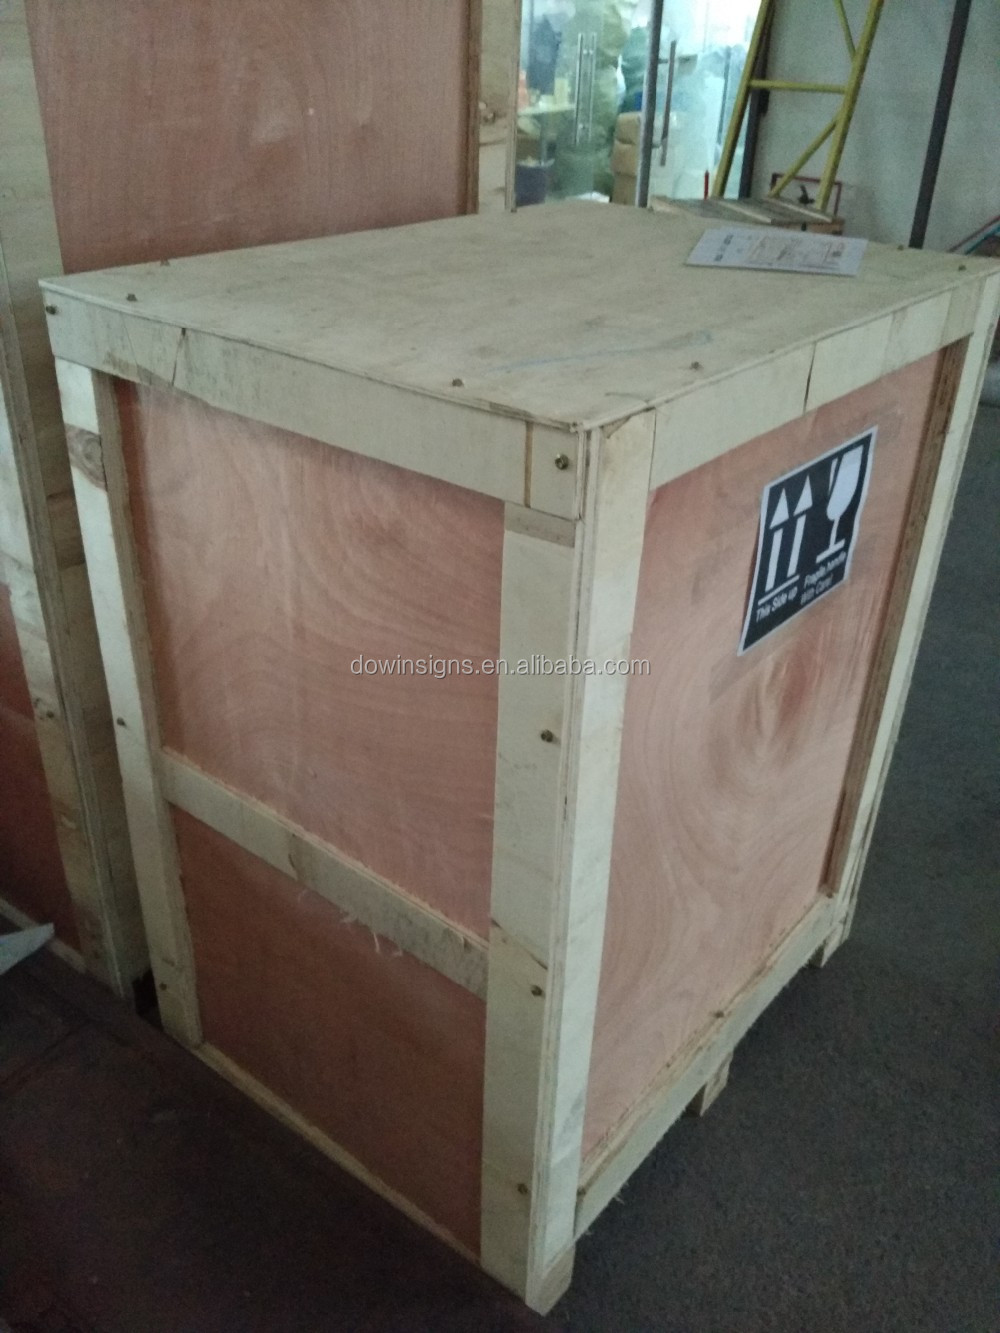 portable mini fiber laser marking machine low price 10w 20w 50w